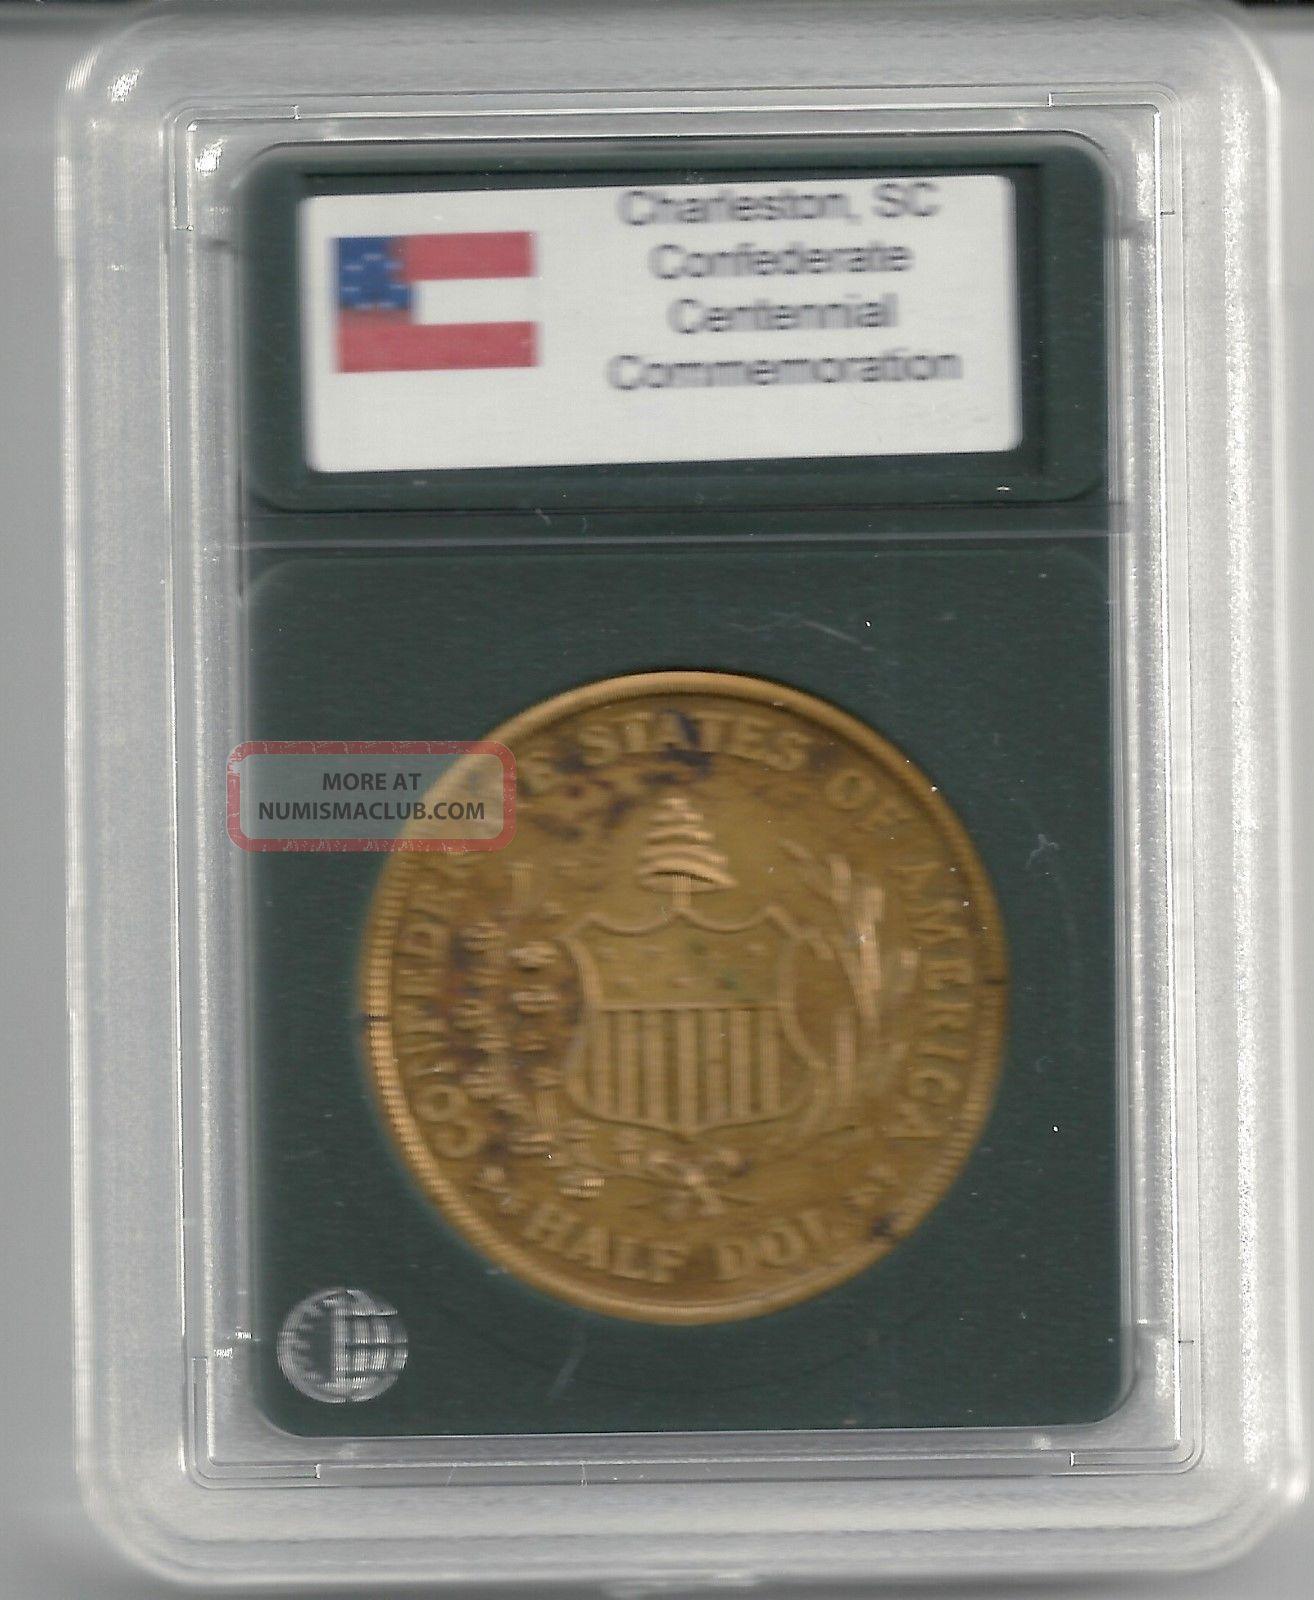 Confederate States Csa Half Dollar Dol Civil War Centennial Coin Good For Token Exonumia photo